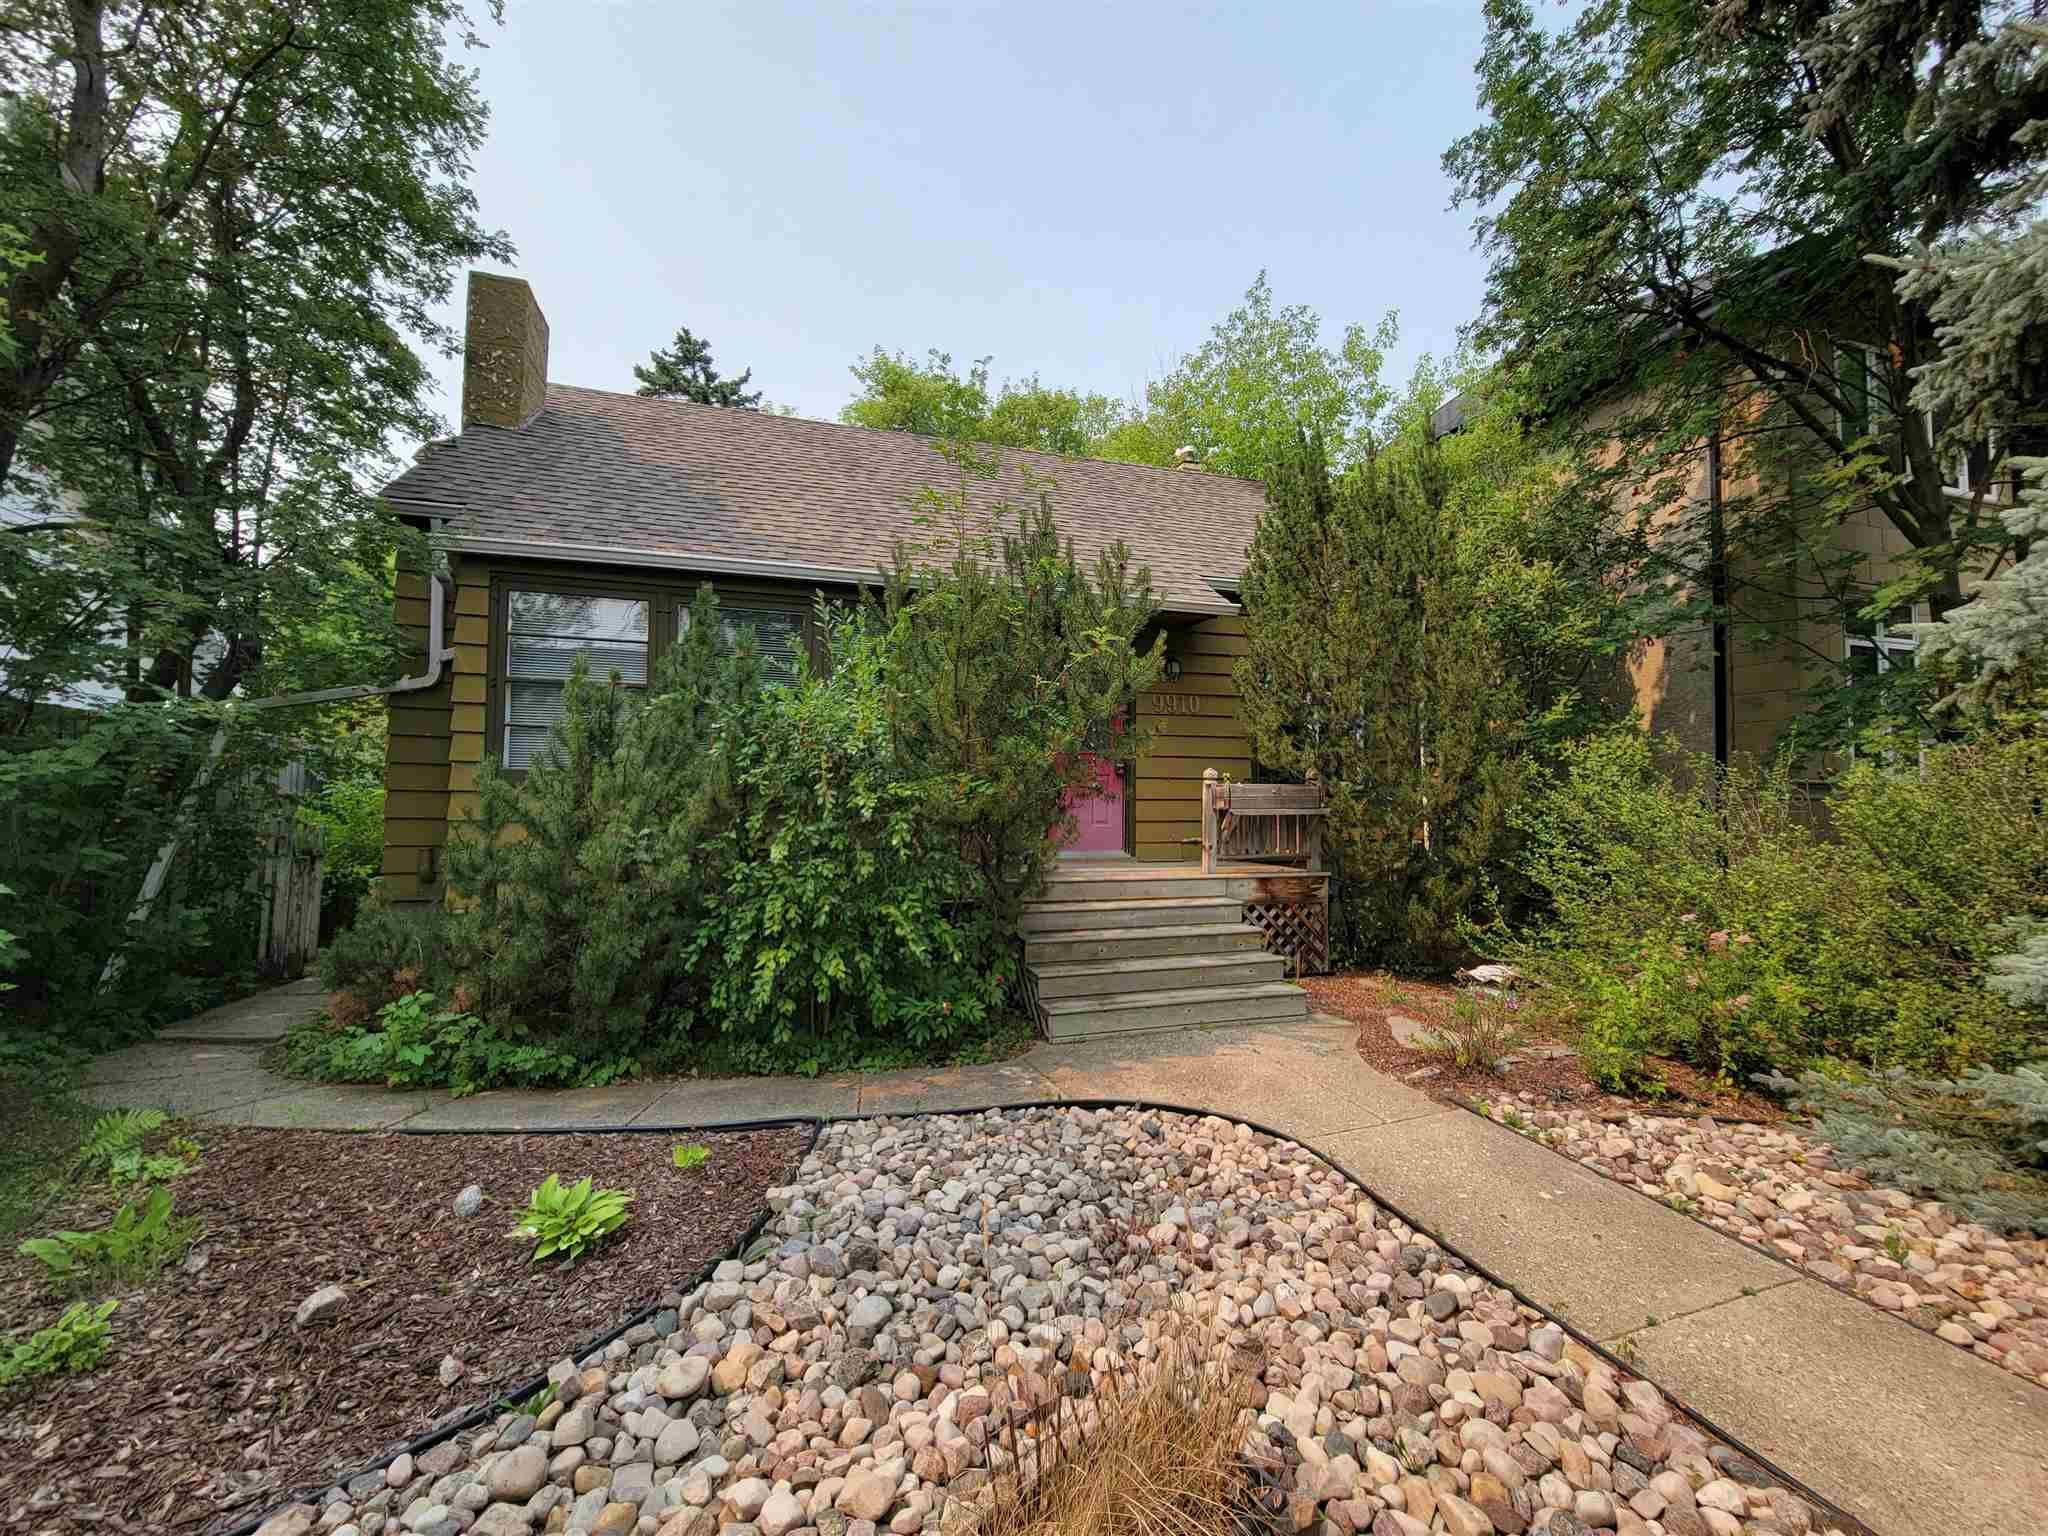 Main Photo: 9910 144 Street in Edmonton: Zone 10 House for sale : MLS®# E4254631